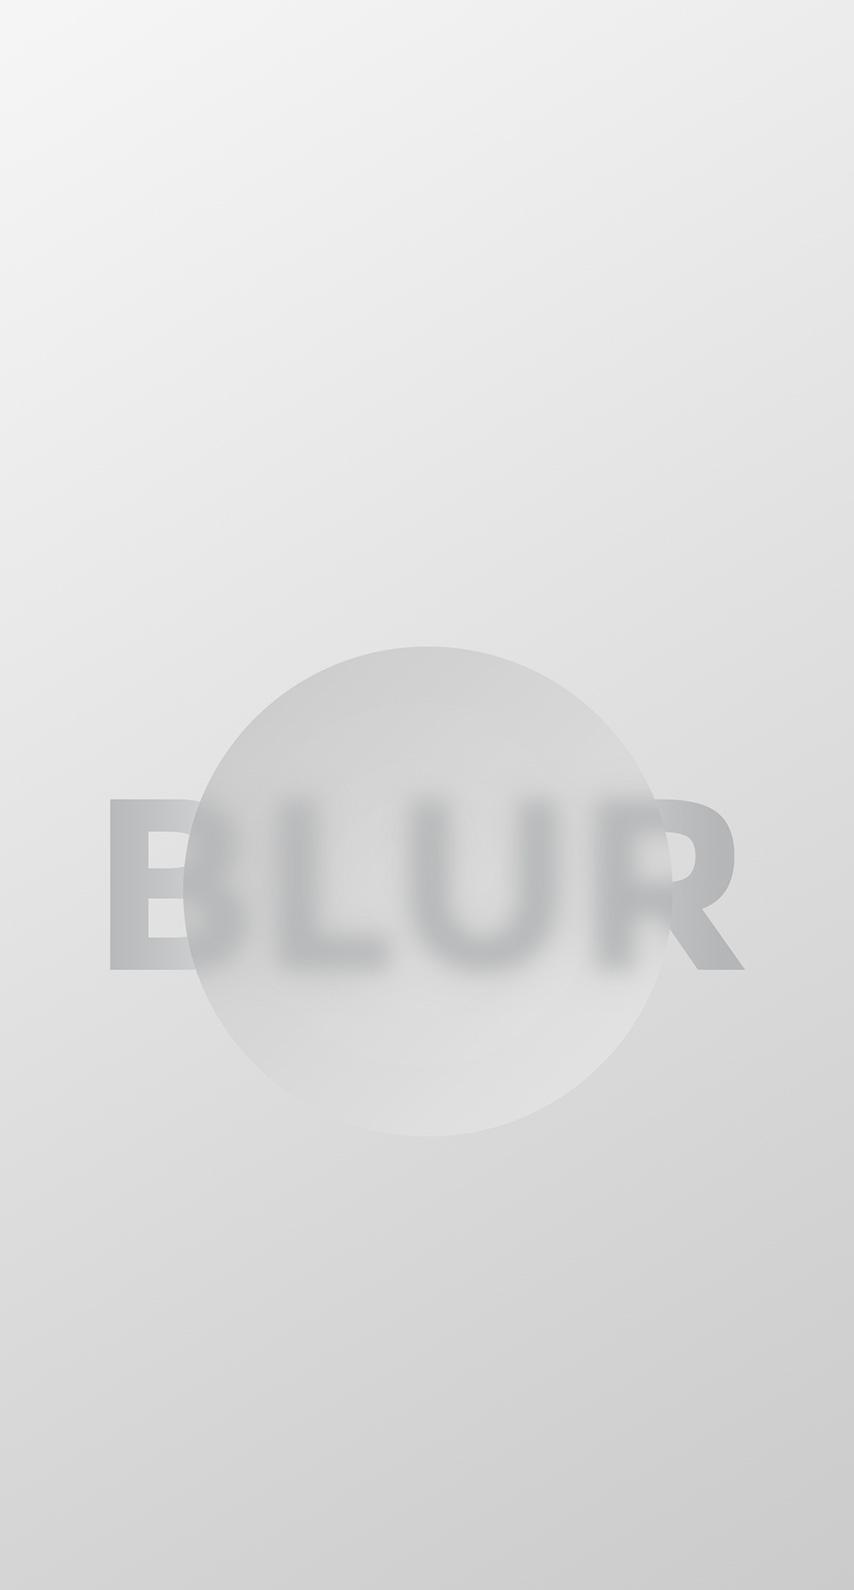 world wide web, logo